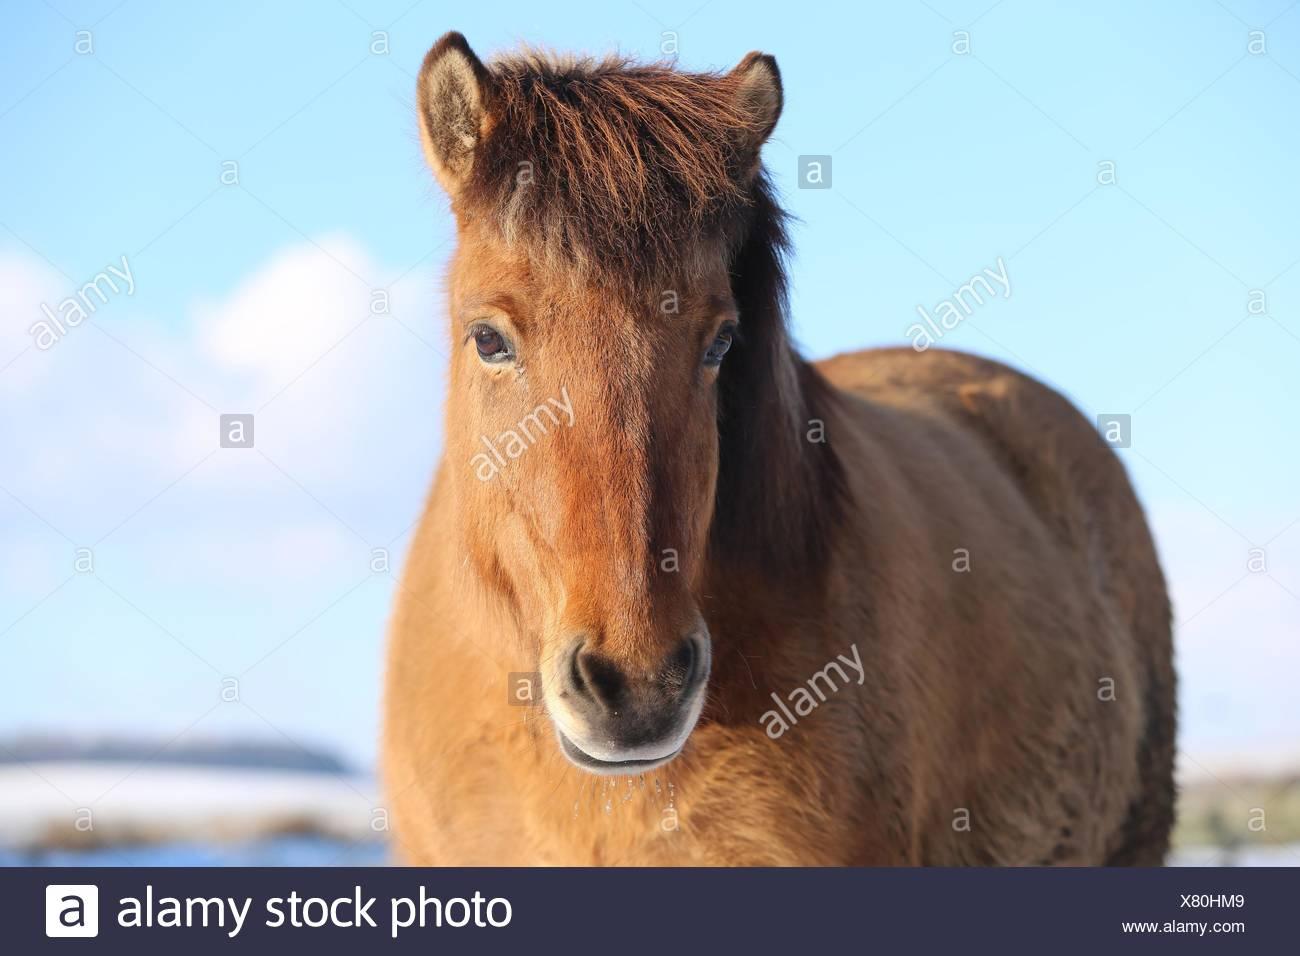 Icelandic horse Portrait - Stock Image